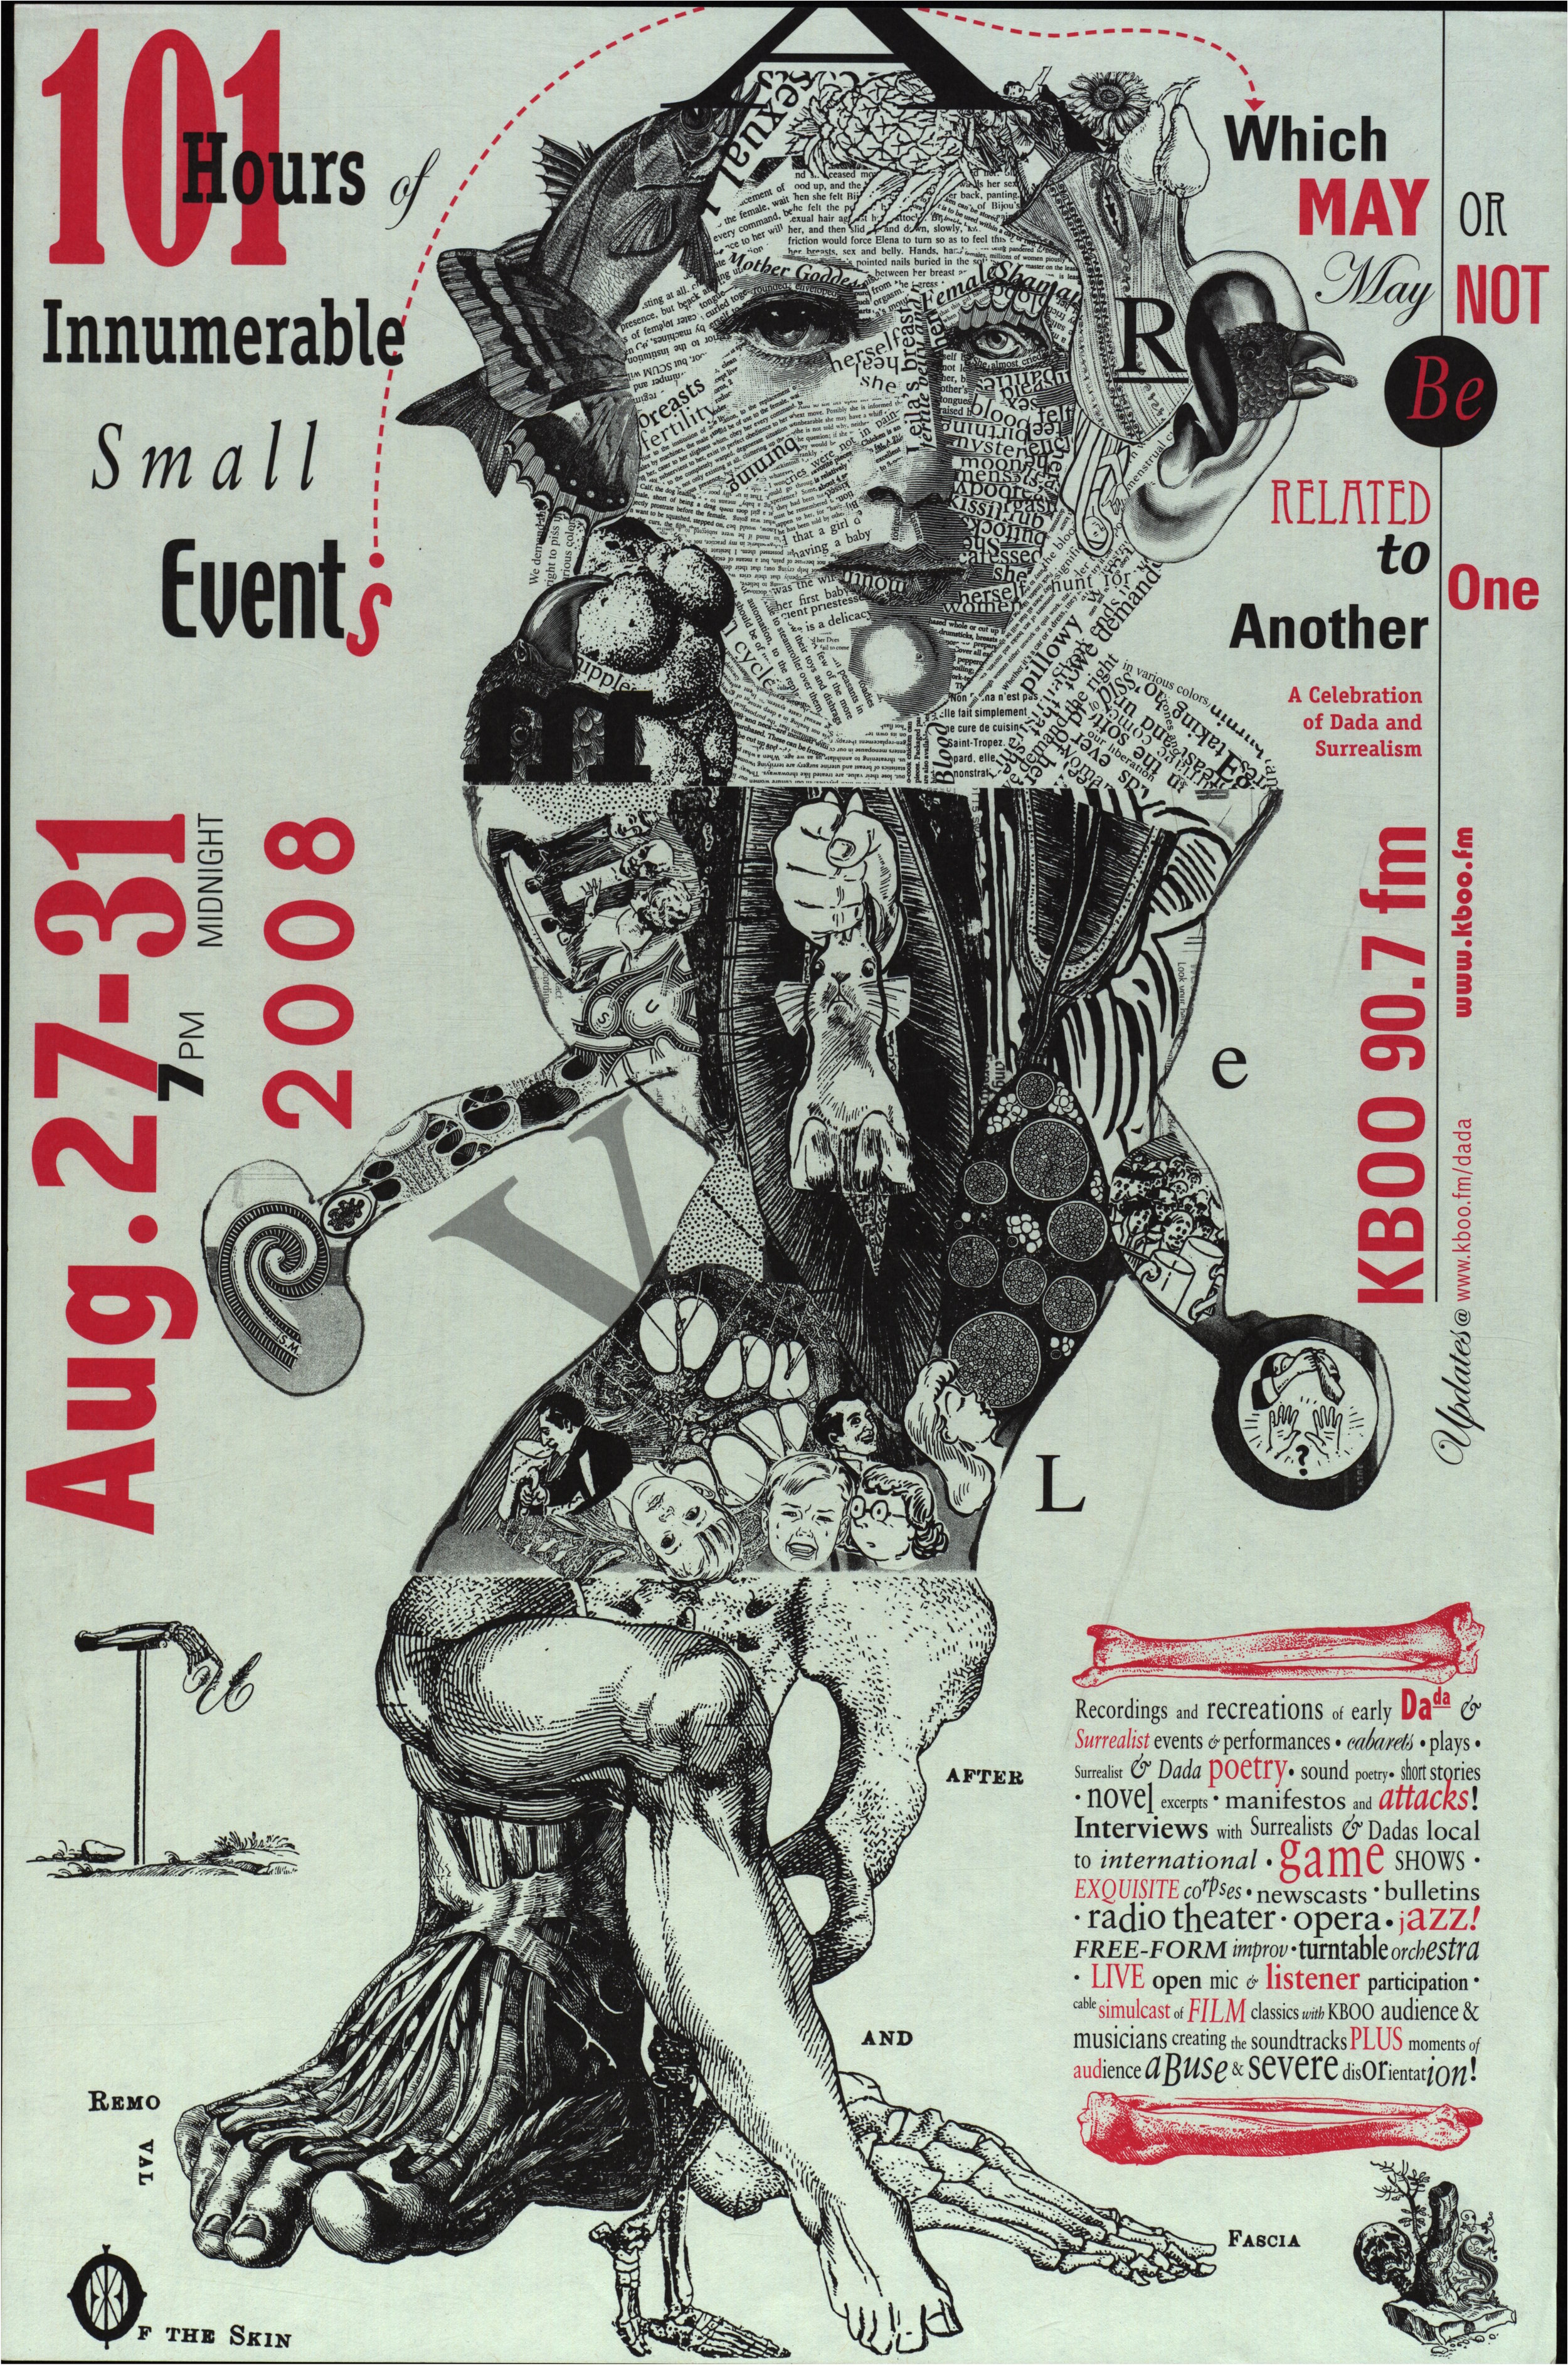 KBOO_Posters_OS_Dada_front_2008.jpg